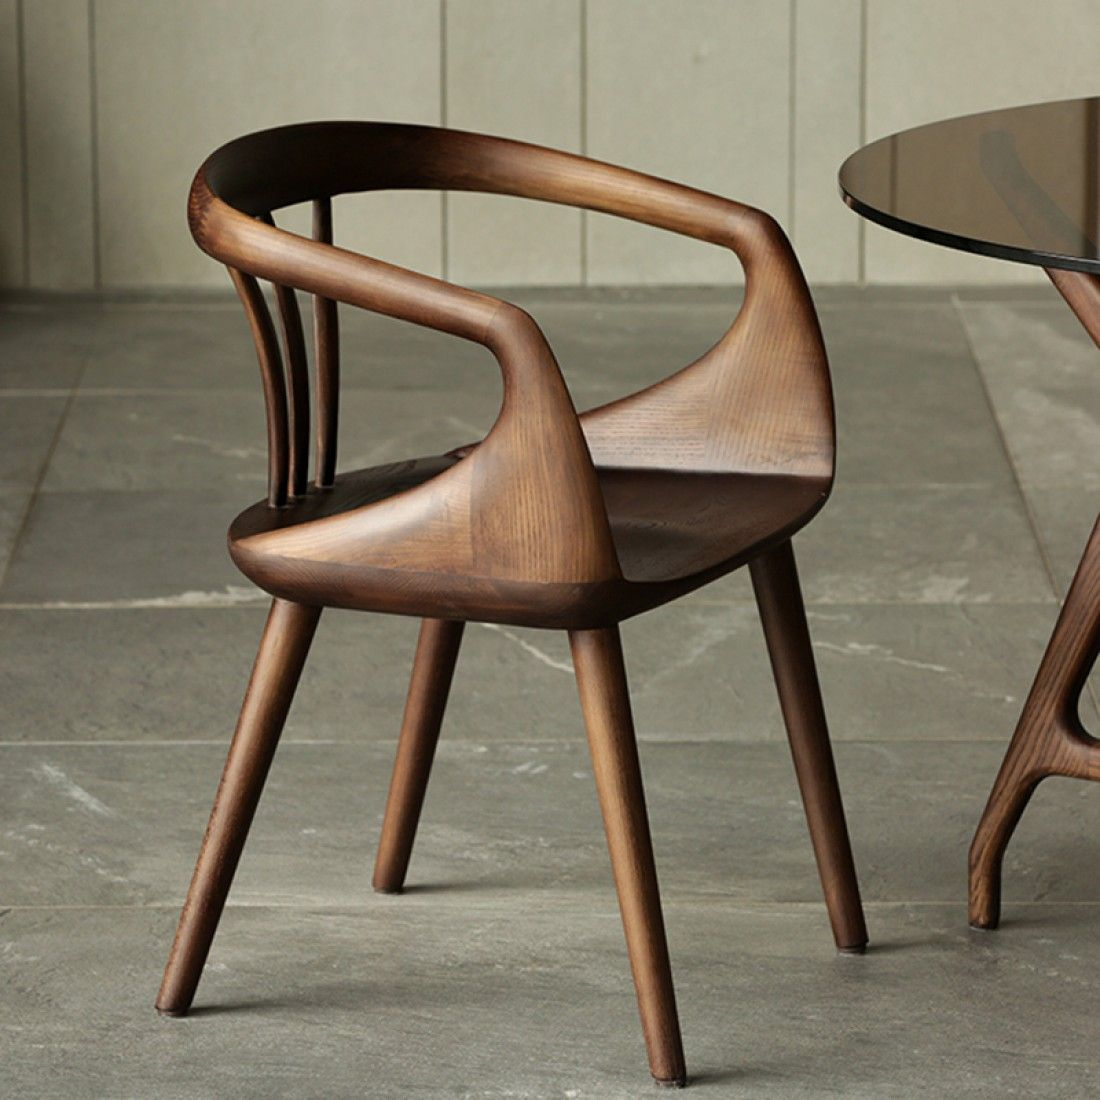 Premium Handmade Wooden Arm Chair Wooden Armchair Chair Wooden Chair